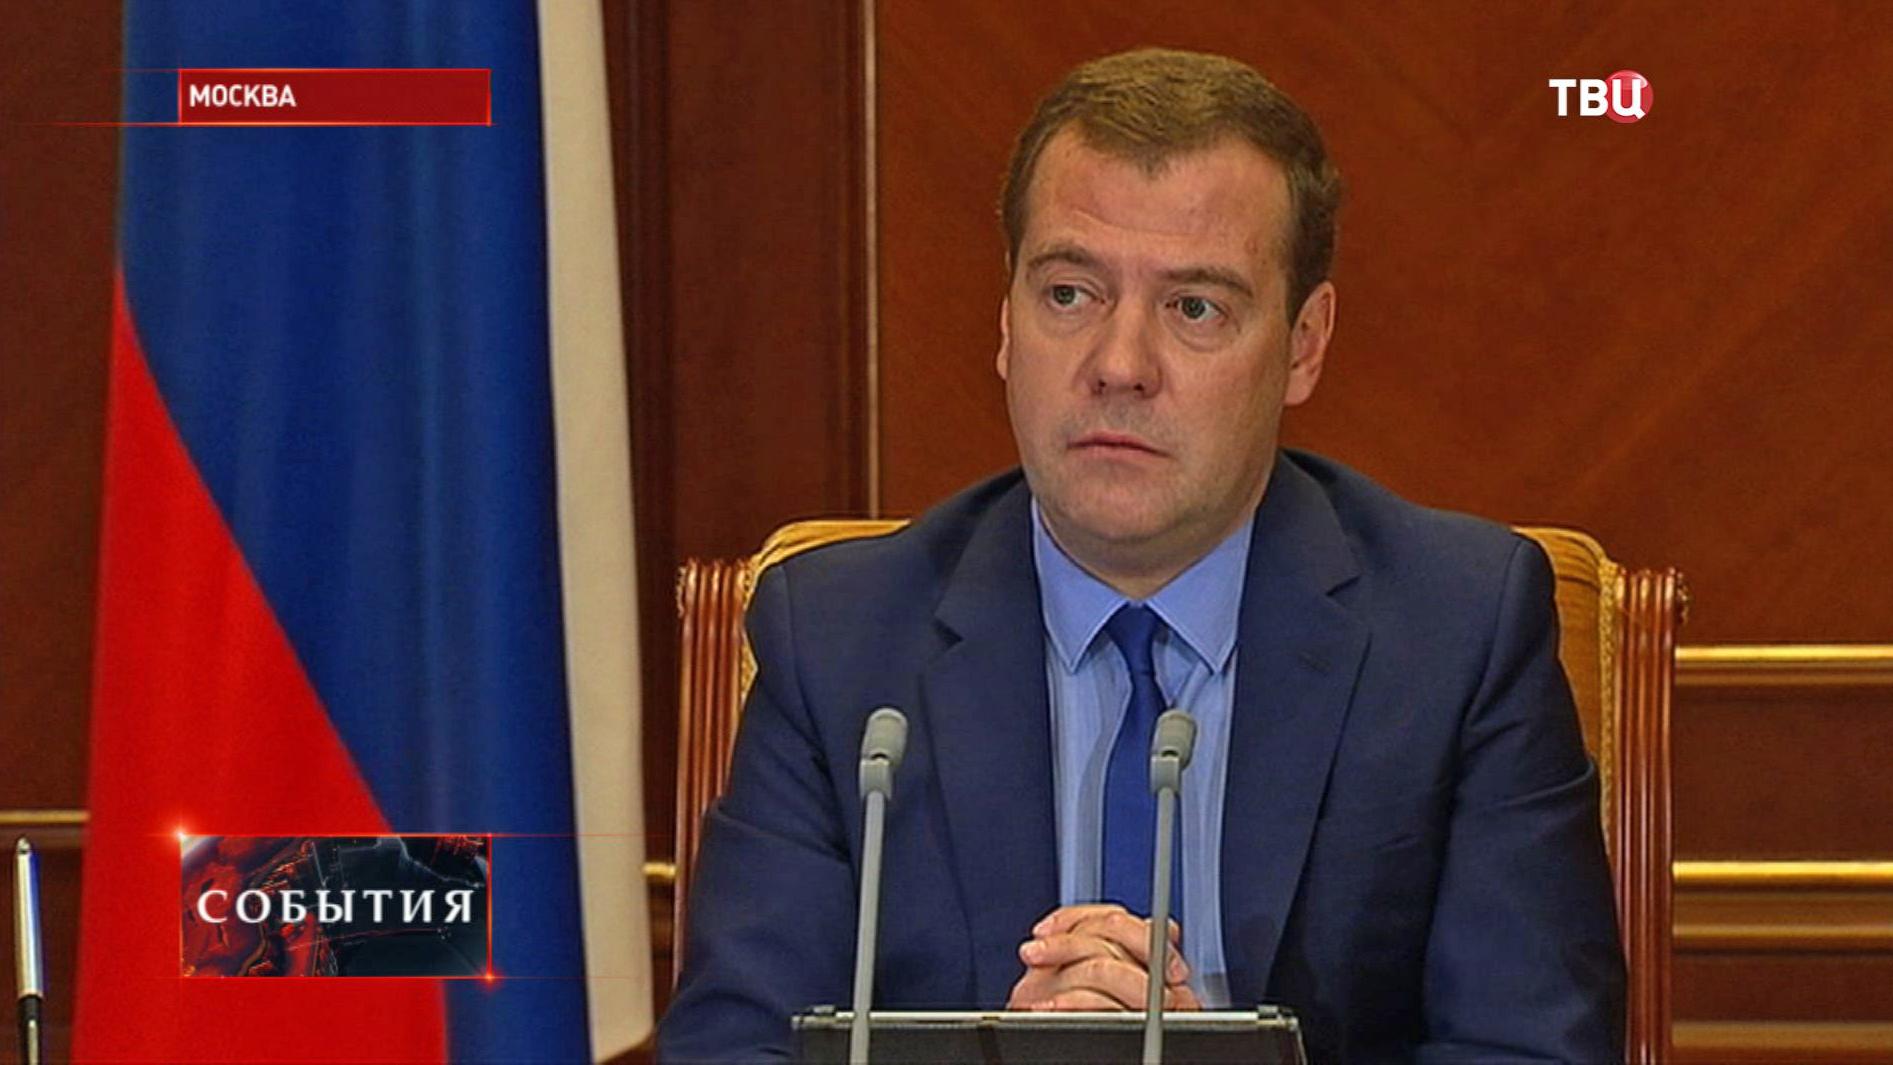 Димирий Медведев